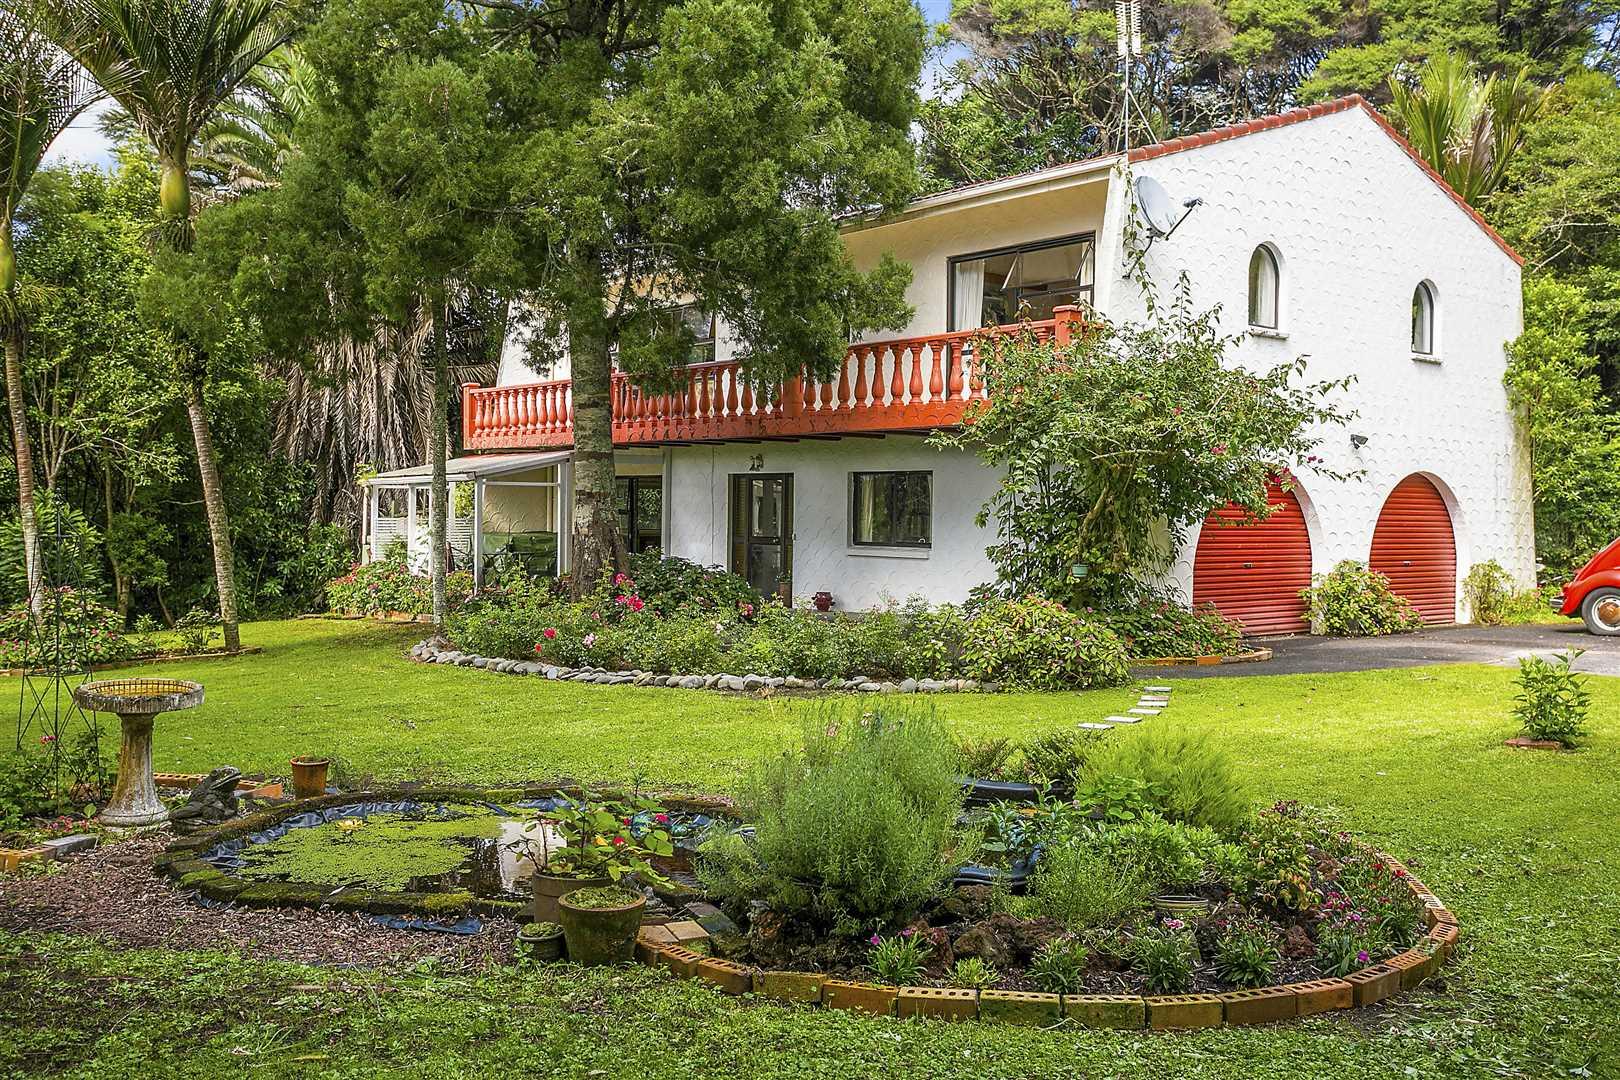 Spanish Villa - Paradise Awaits